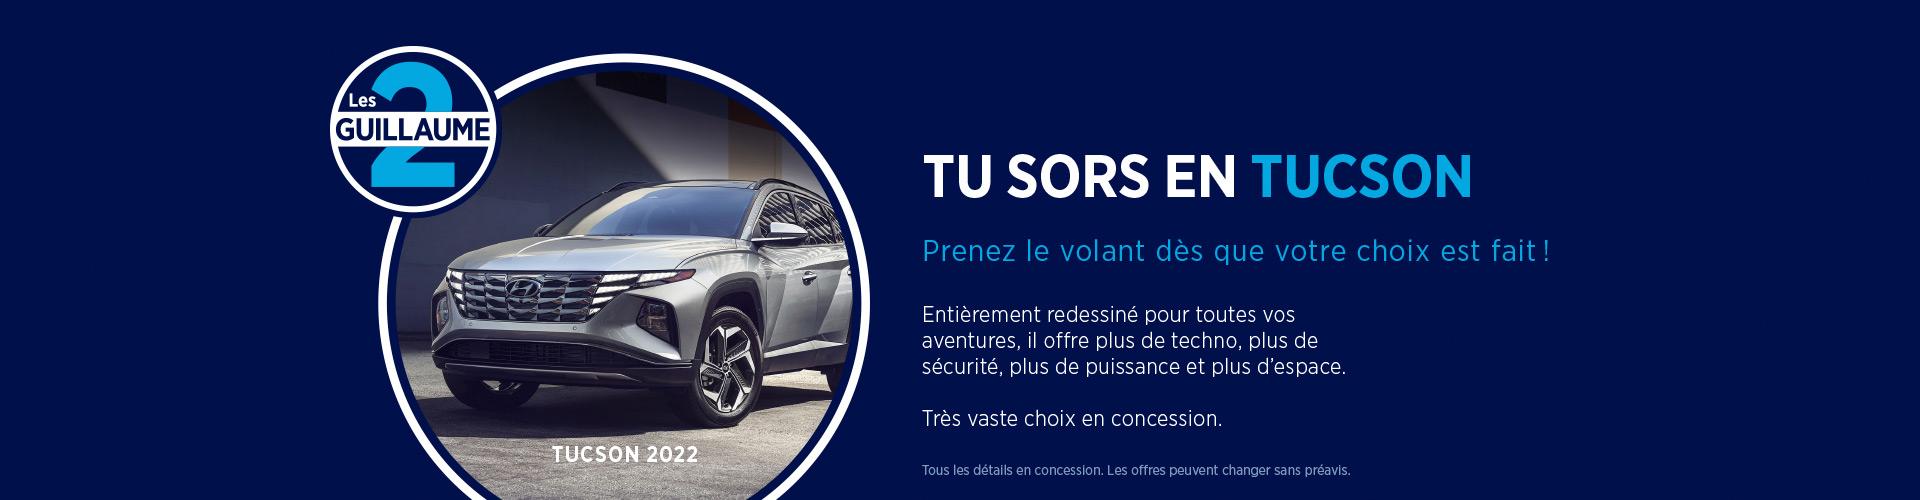 https://rimouskihyundai.com/wp-content/uploads/Rimouski-Hyundai_Offres-mensuelles_Gabarits_1920X500_V1-1.jpg